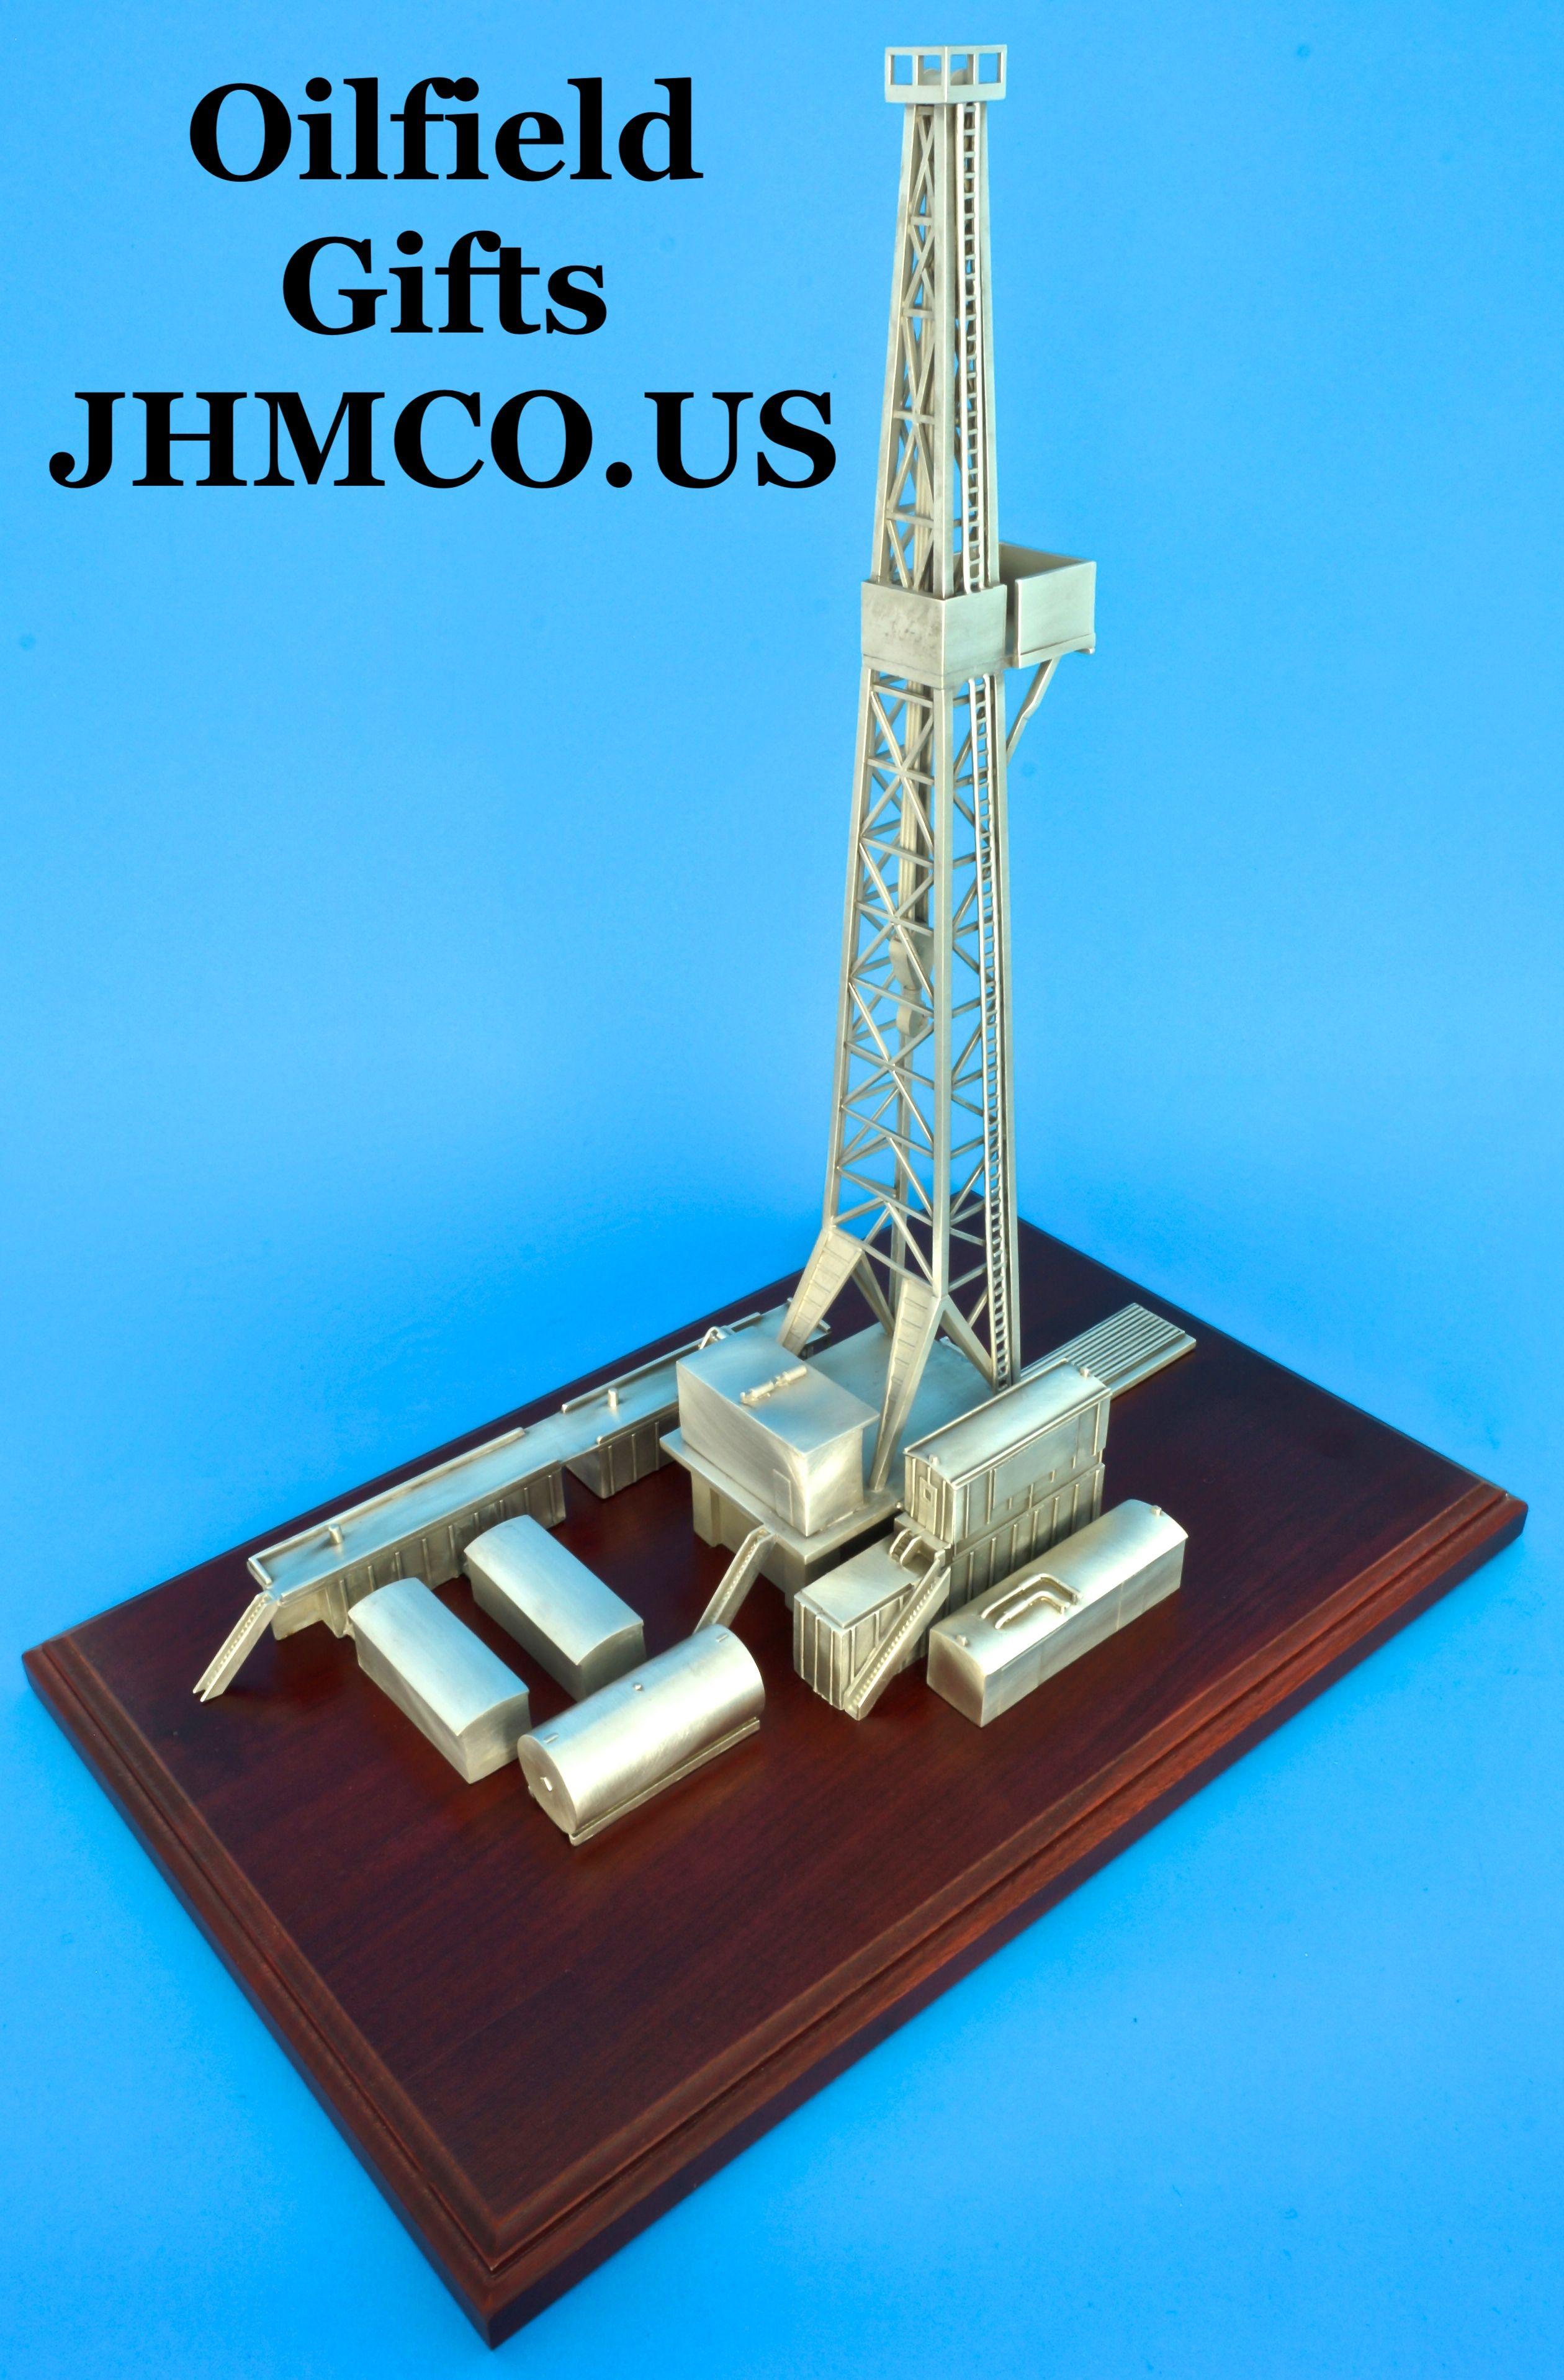 Oilfield Drilling Rig Model Makes A Wonderful Award Or Gift John H Martin Company Since 1937